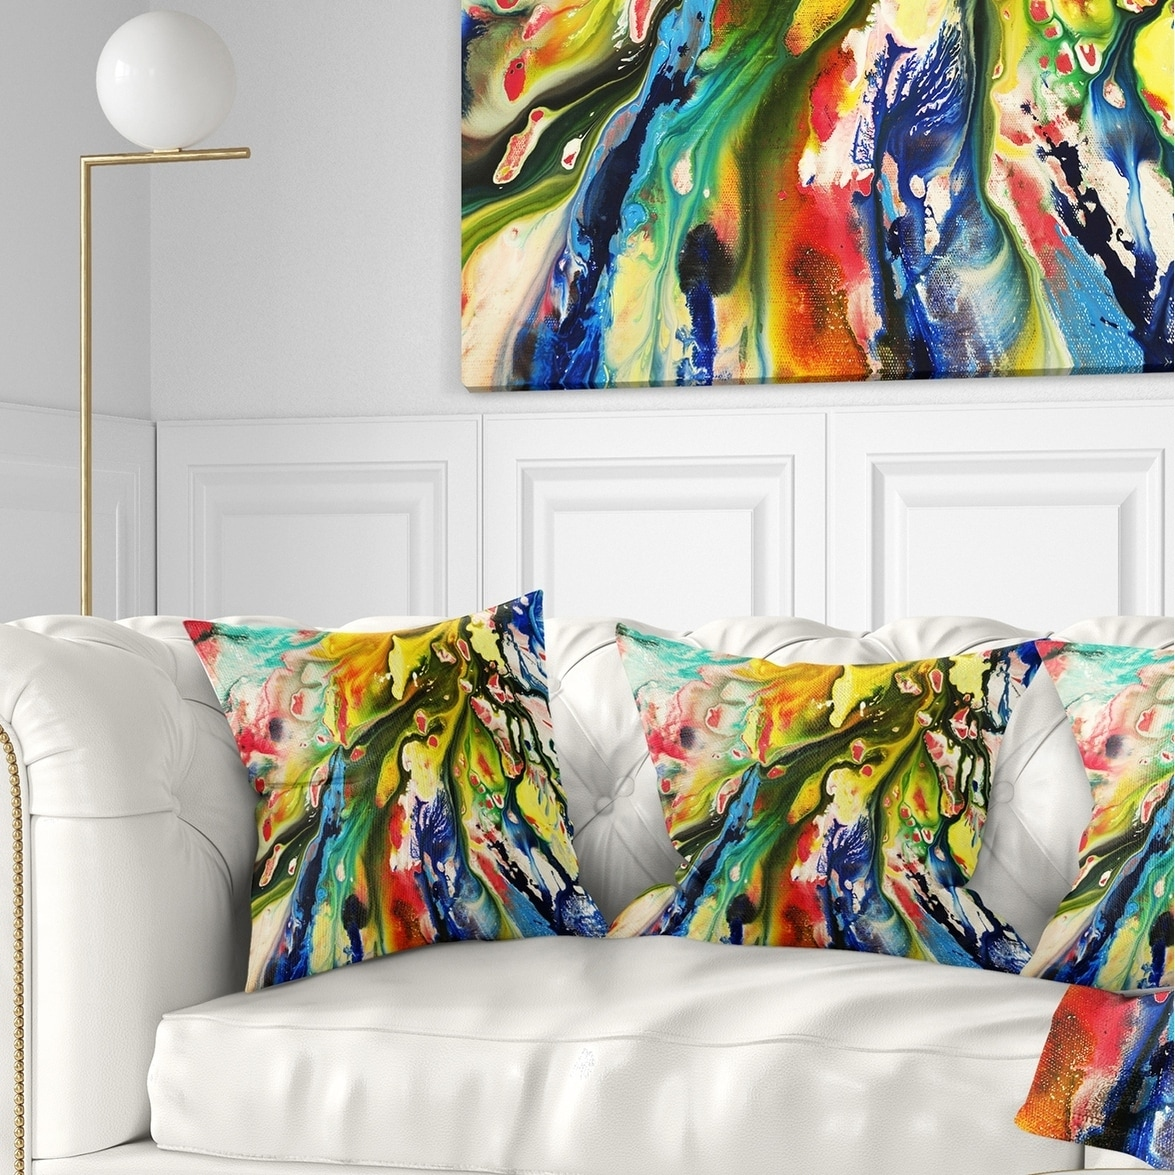 Design Art Designart Mixed Oil Color Texture Abstract Throw Pillow Walmart Com Walmart Com